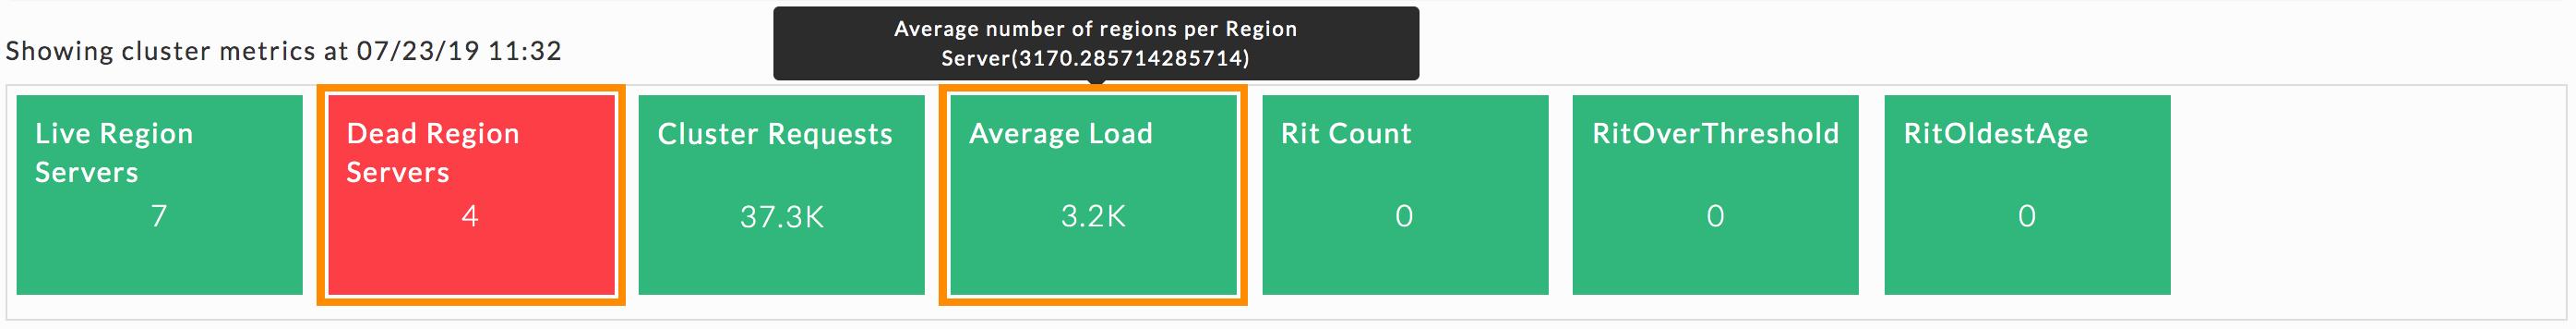 uc-monitoring-HBase-KPIsDeadRegion2.png